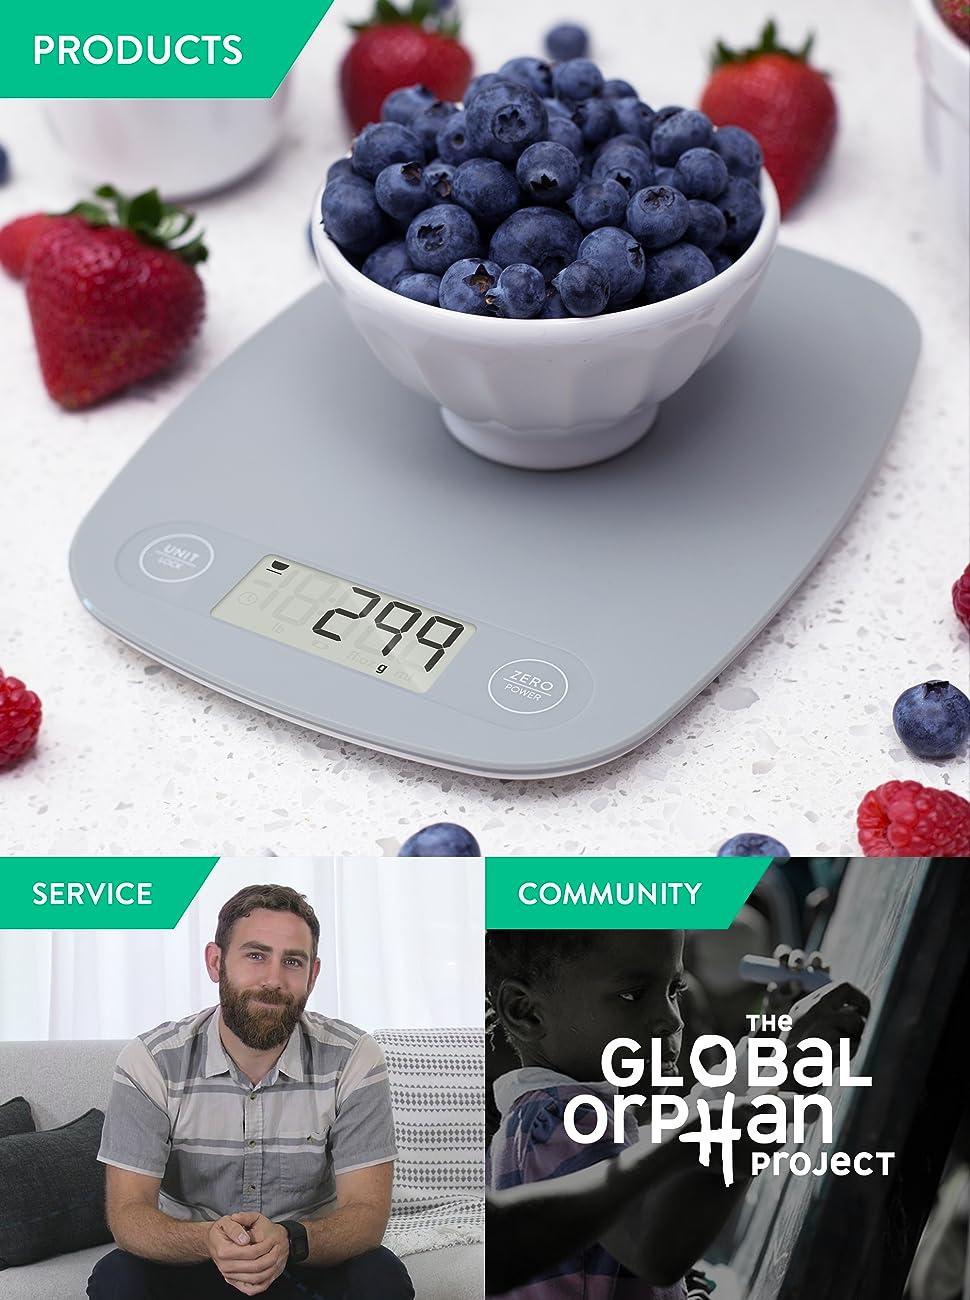 Amazon.com: Digital Kitchen Scale/Food Scale - Ultra Slim ...